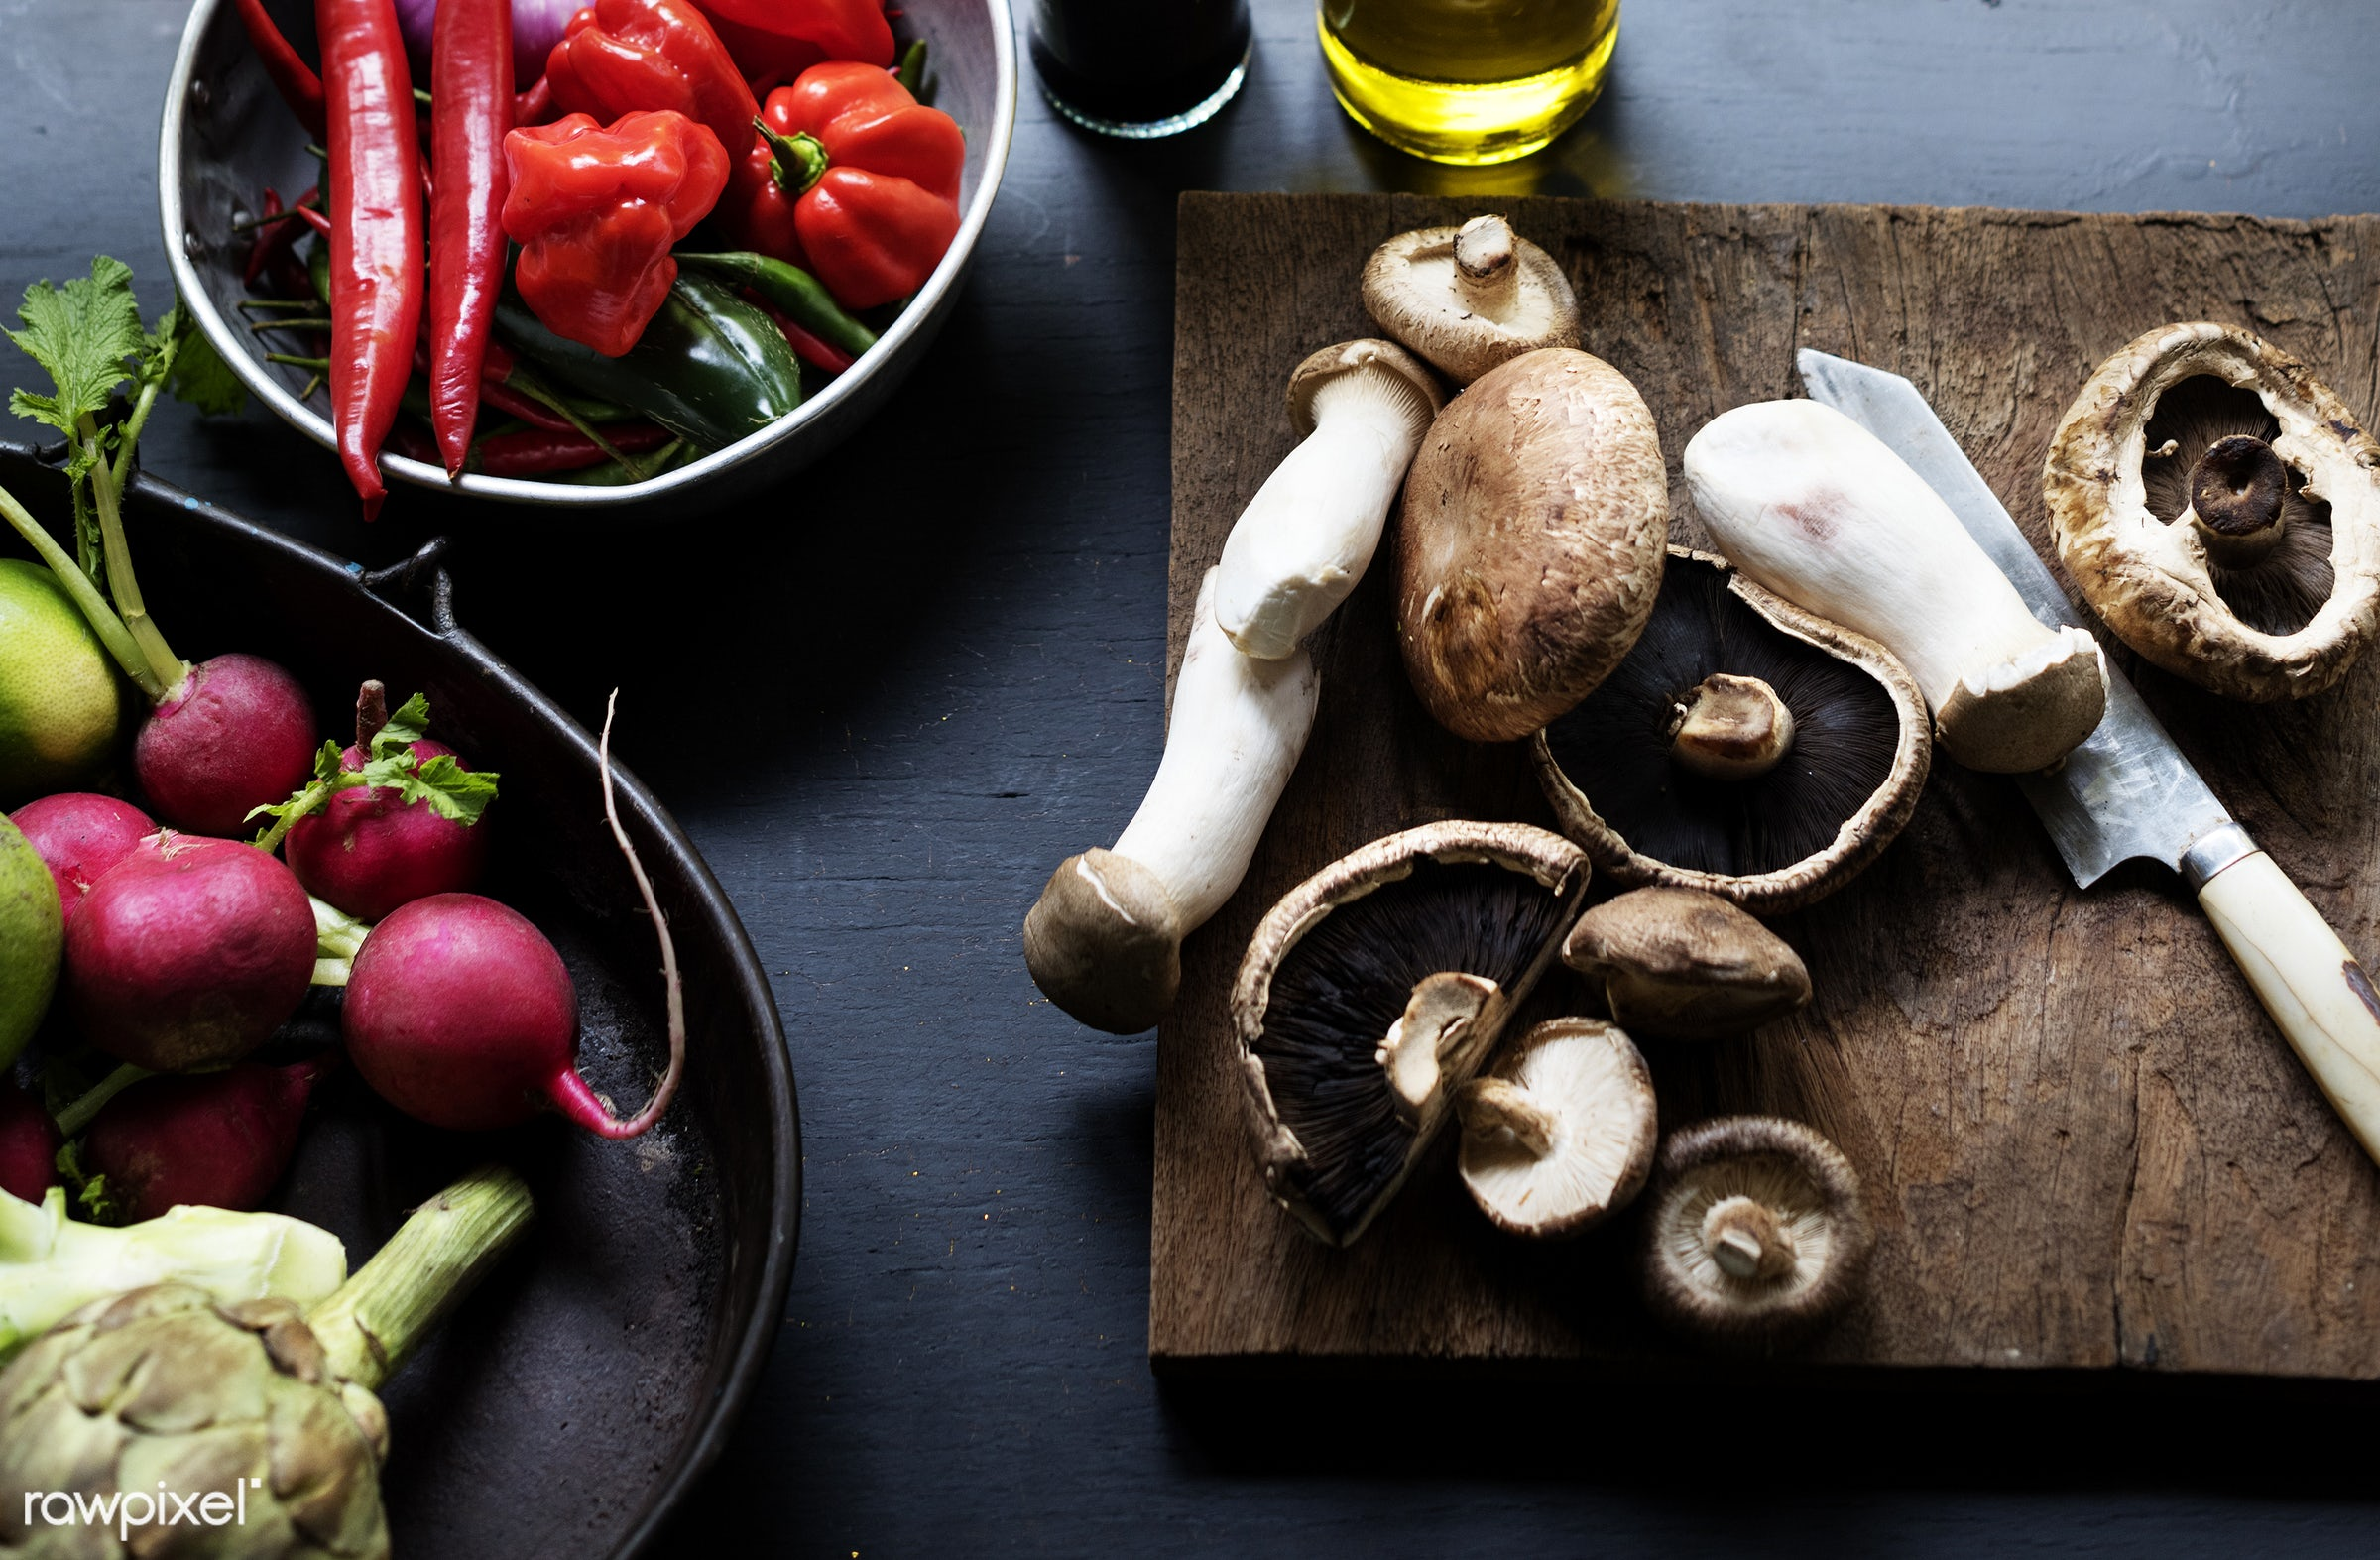 different, mushroom, raw, variation, turnips, bell pepper, gastronomy, type, kind, fresh, vegetarian, ingredient, cooking,...